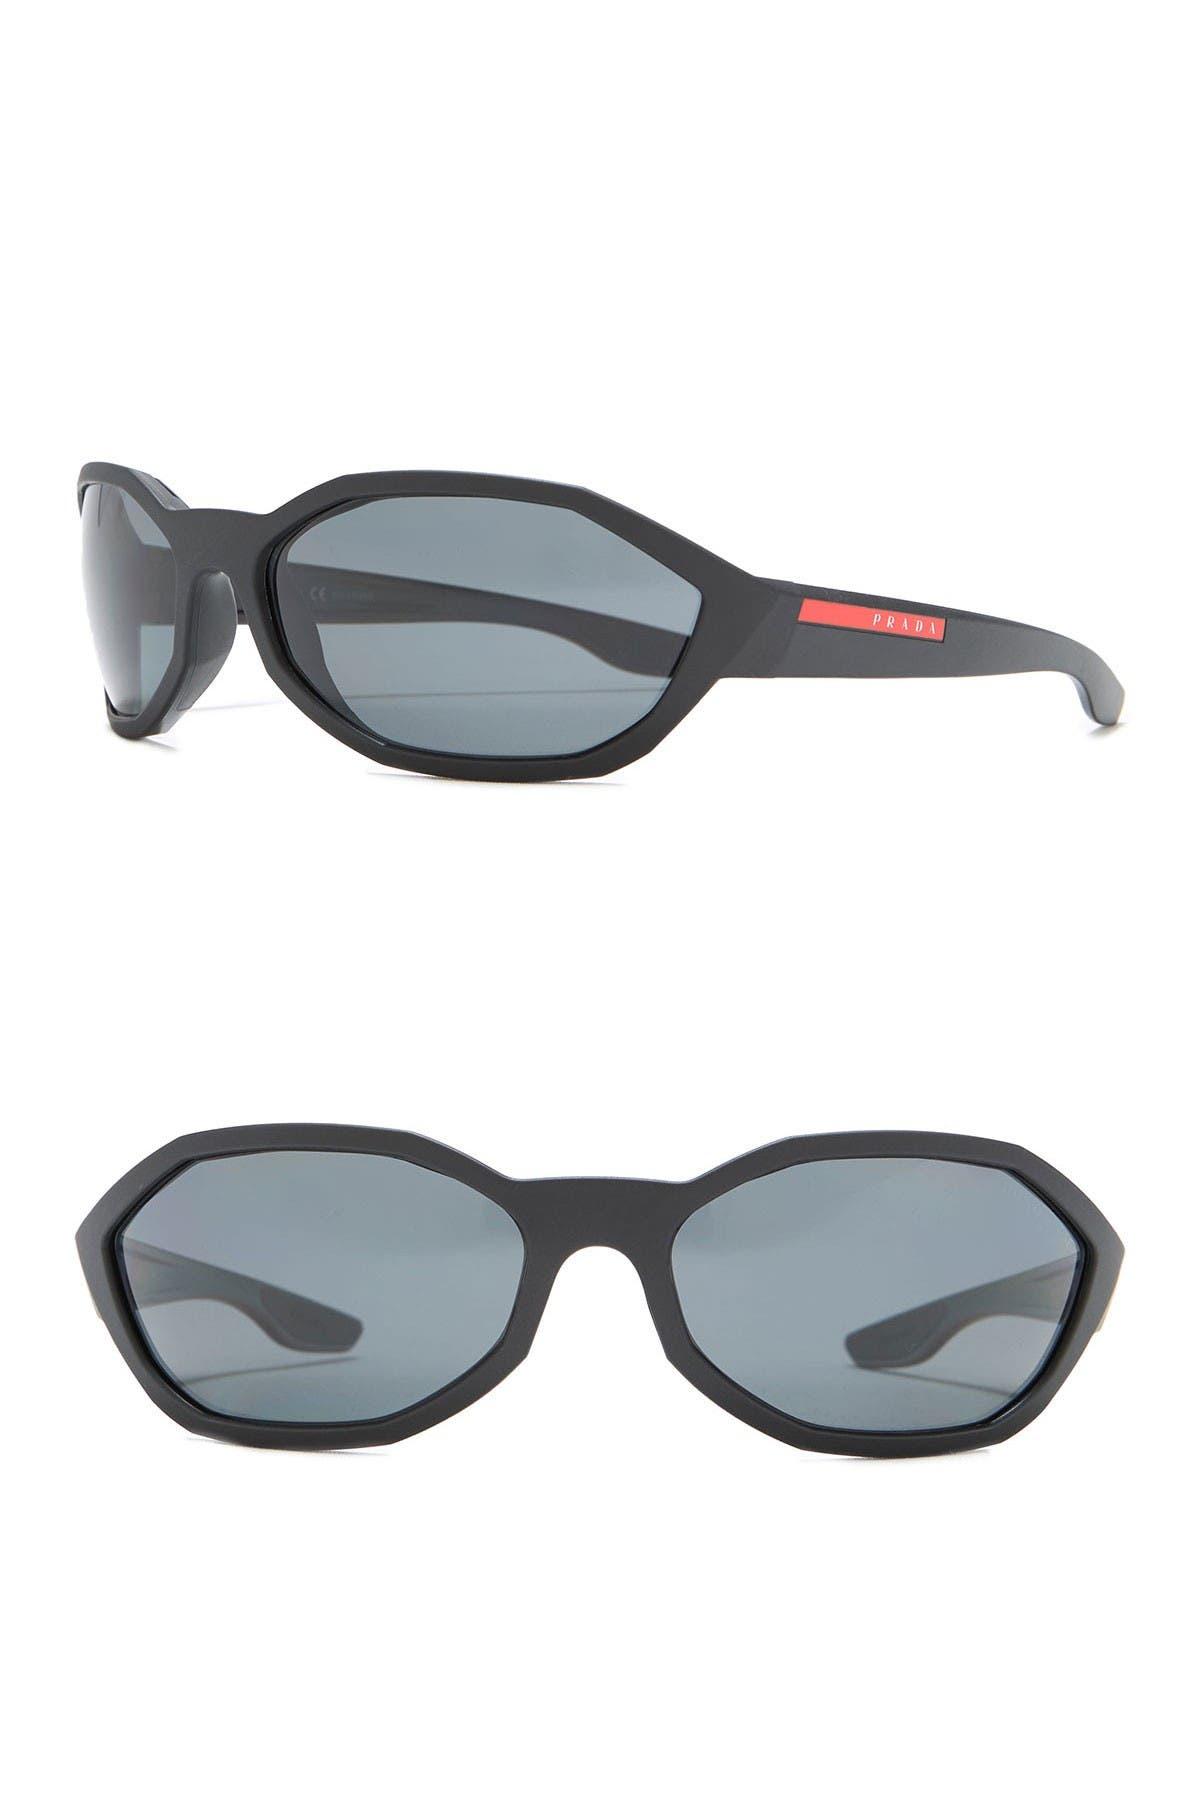 Image of PRADA LINEA ROSSA 67mm Wrap Around Sunglasses